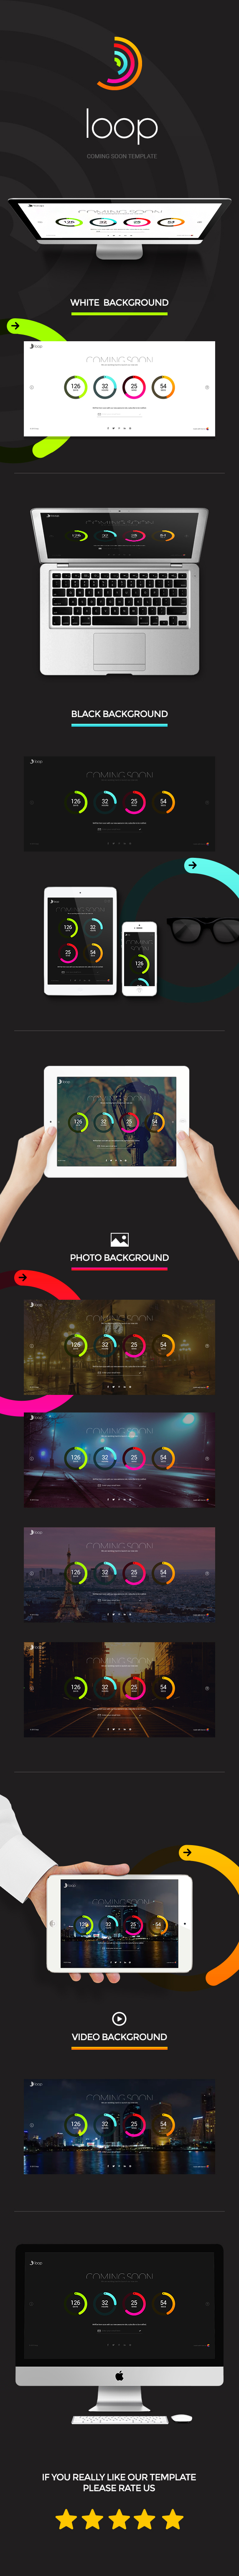 Loop - Animated Coming Soon Countdown Template by creative_era ...